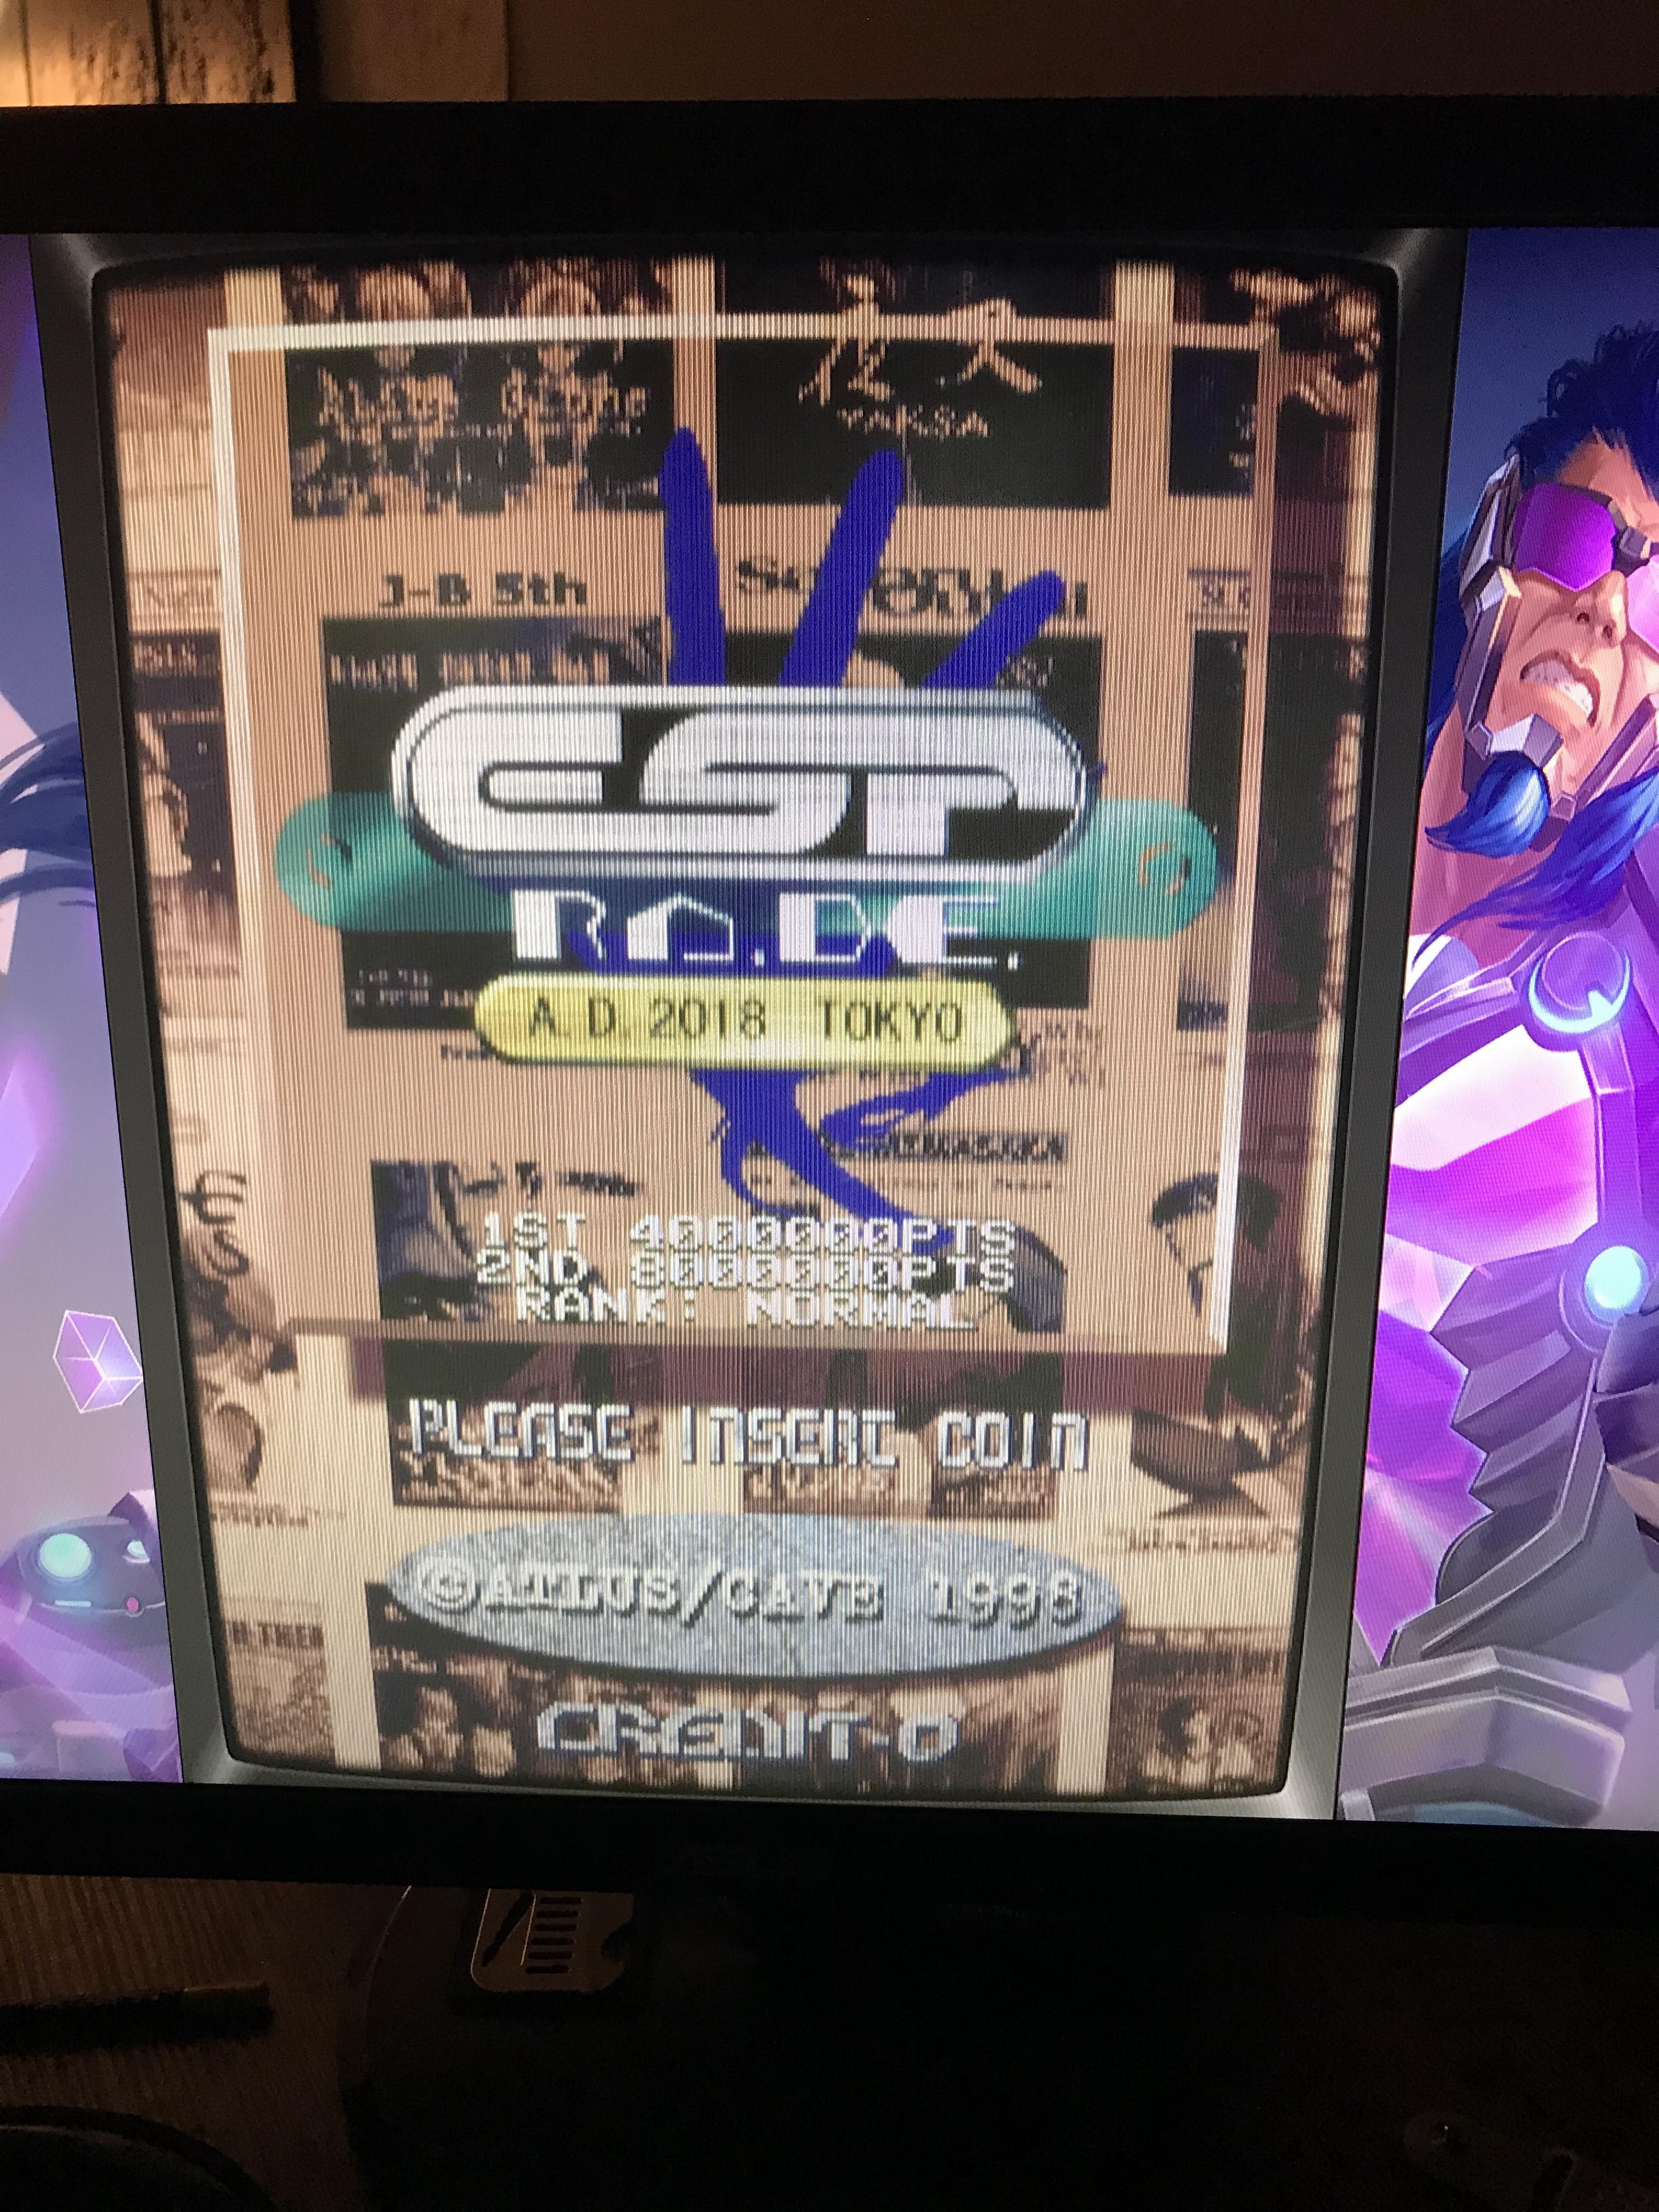 Overwhelmed by Emulation options - Retro & Arcade Gaming - rllmuk